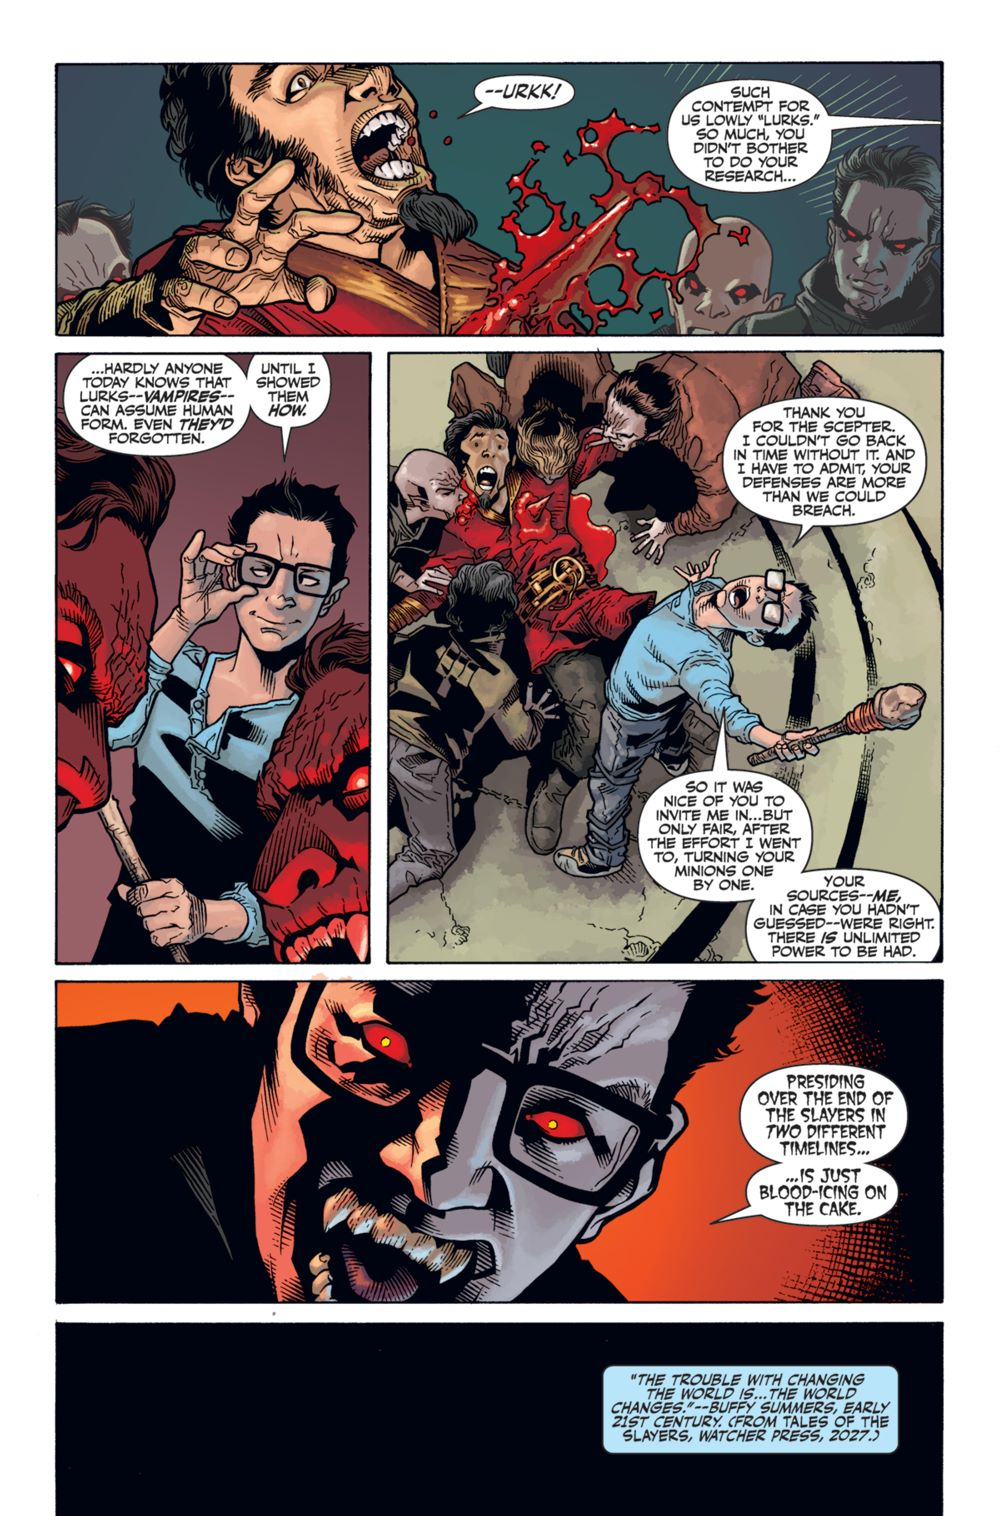 Buffy_Season12_HC_PRESS_113 ComicList Previews: BUFFY THE VAMPIRE SLAYER SEASON 12 LIBRARY EDITION VOLUME 1 HC